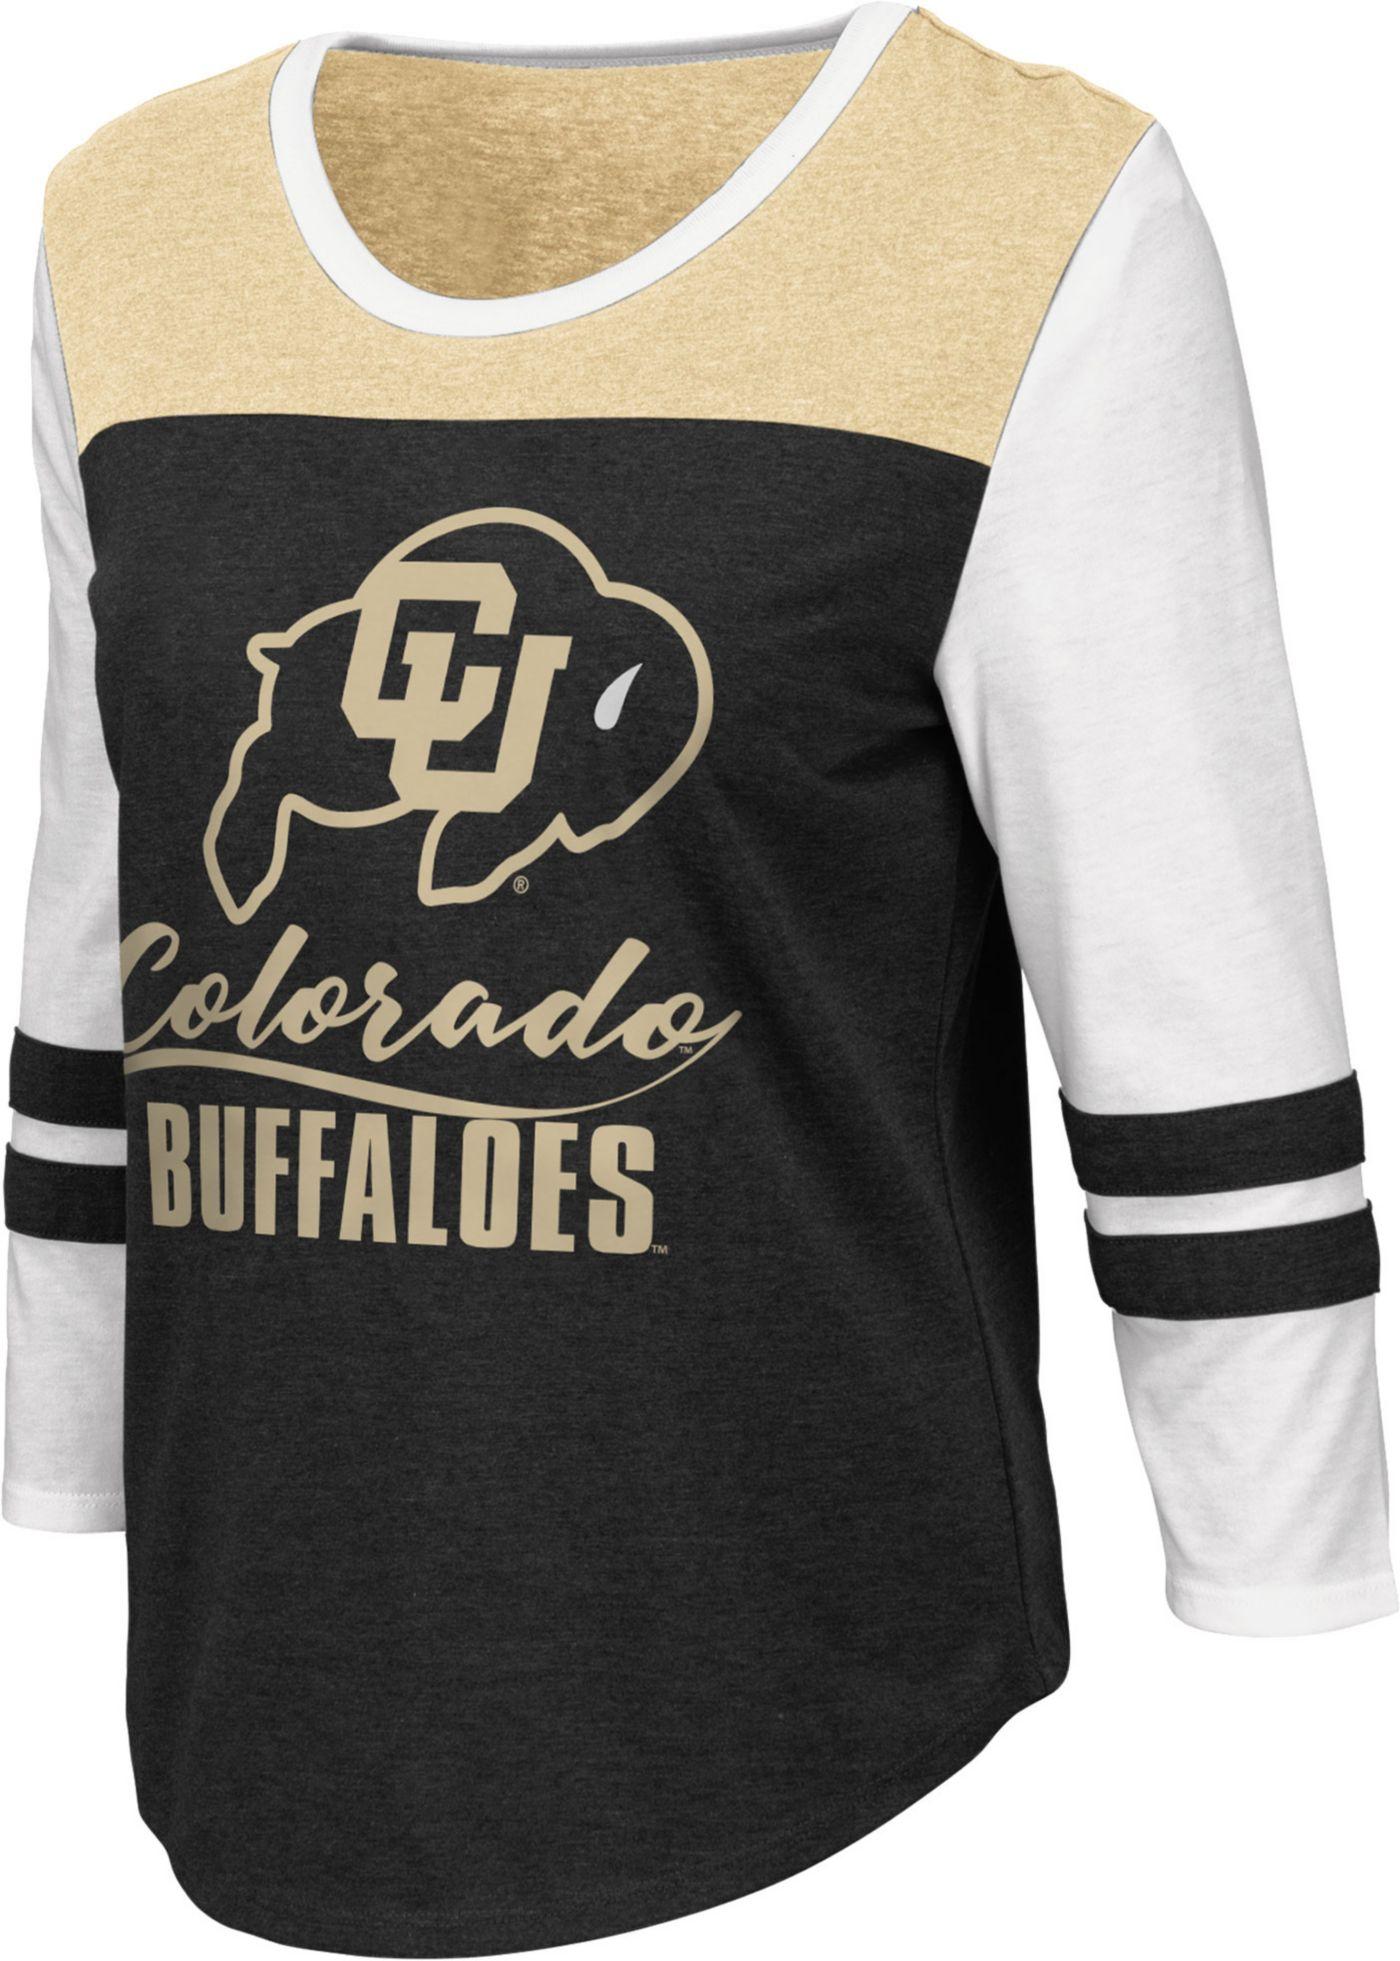 Colosseum Women's Colorado Buffaloes ¾ Sleeve Raglan Black T-Shirt